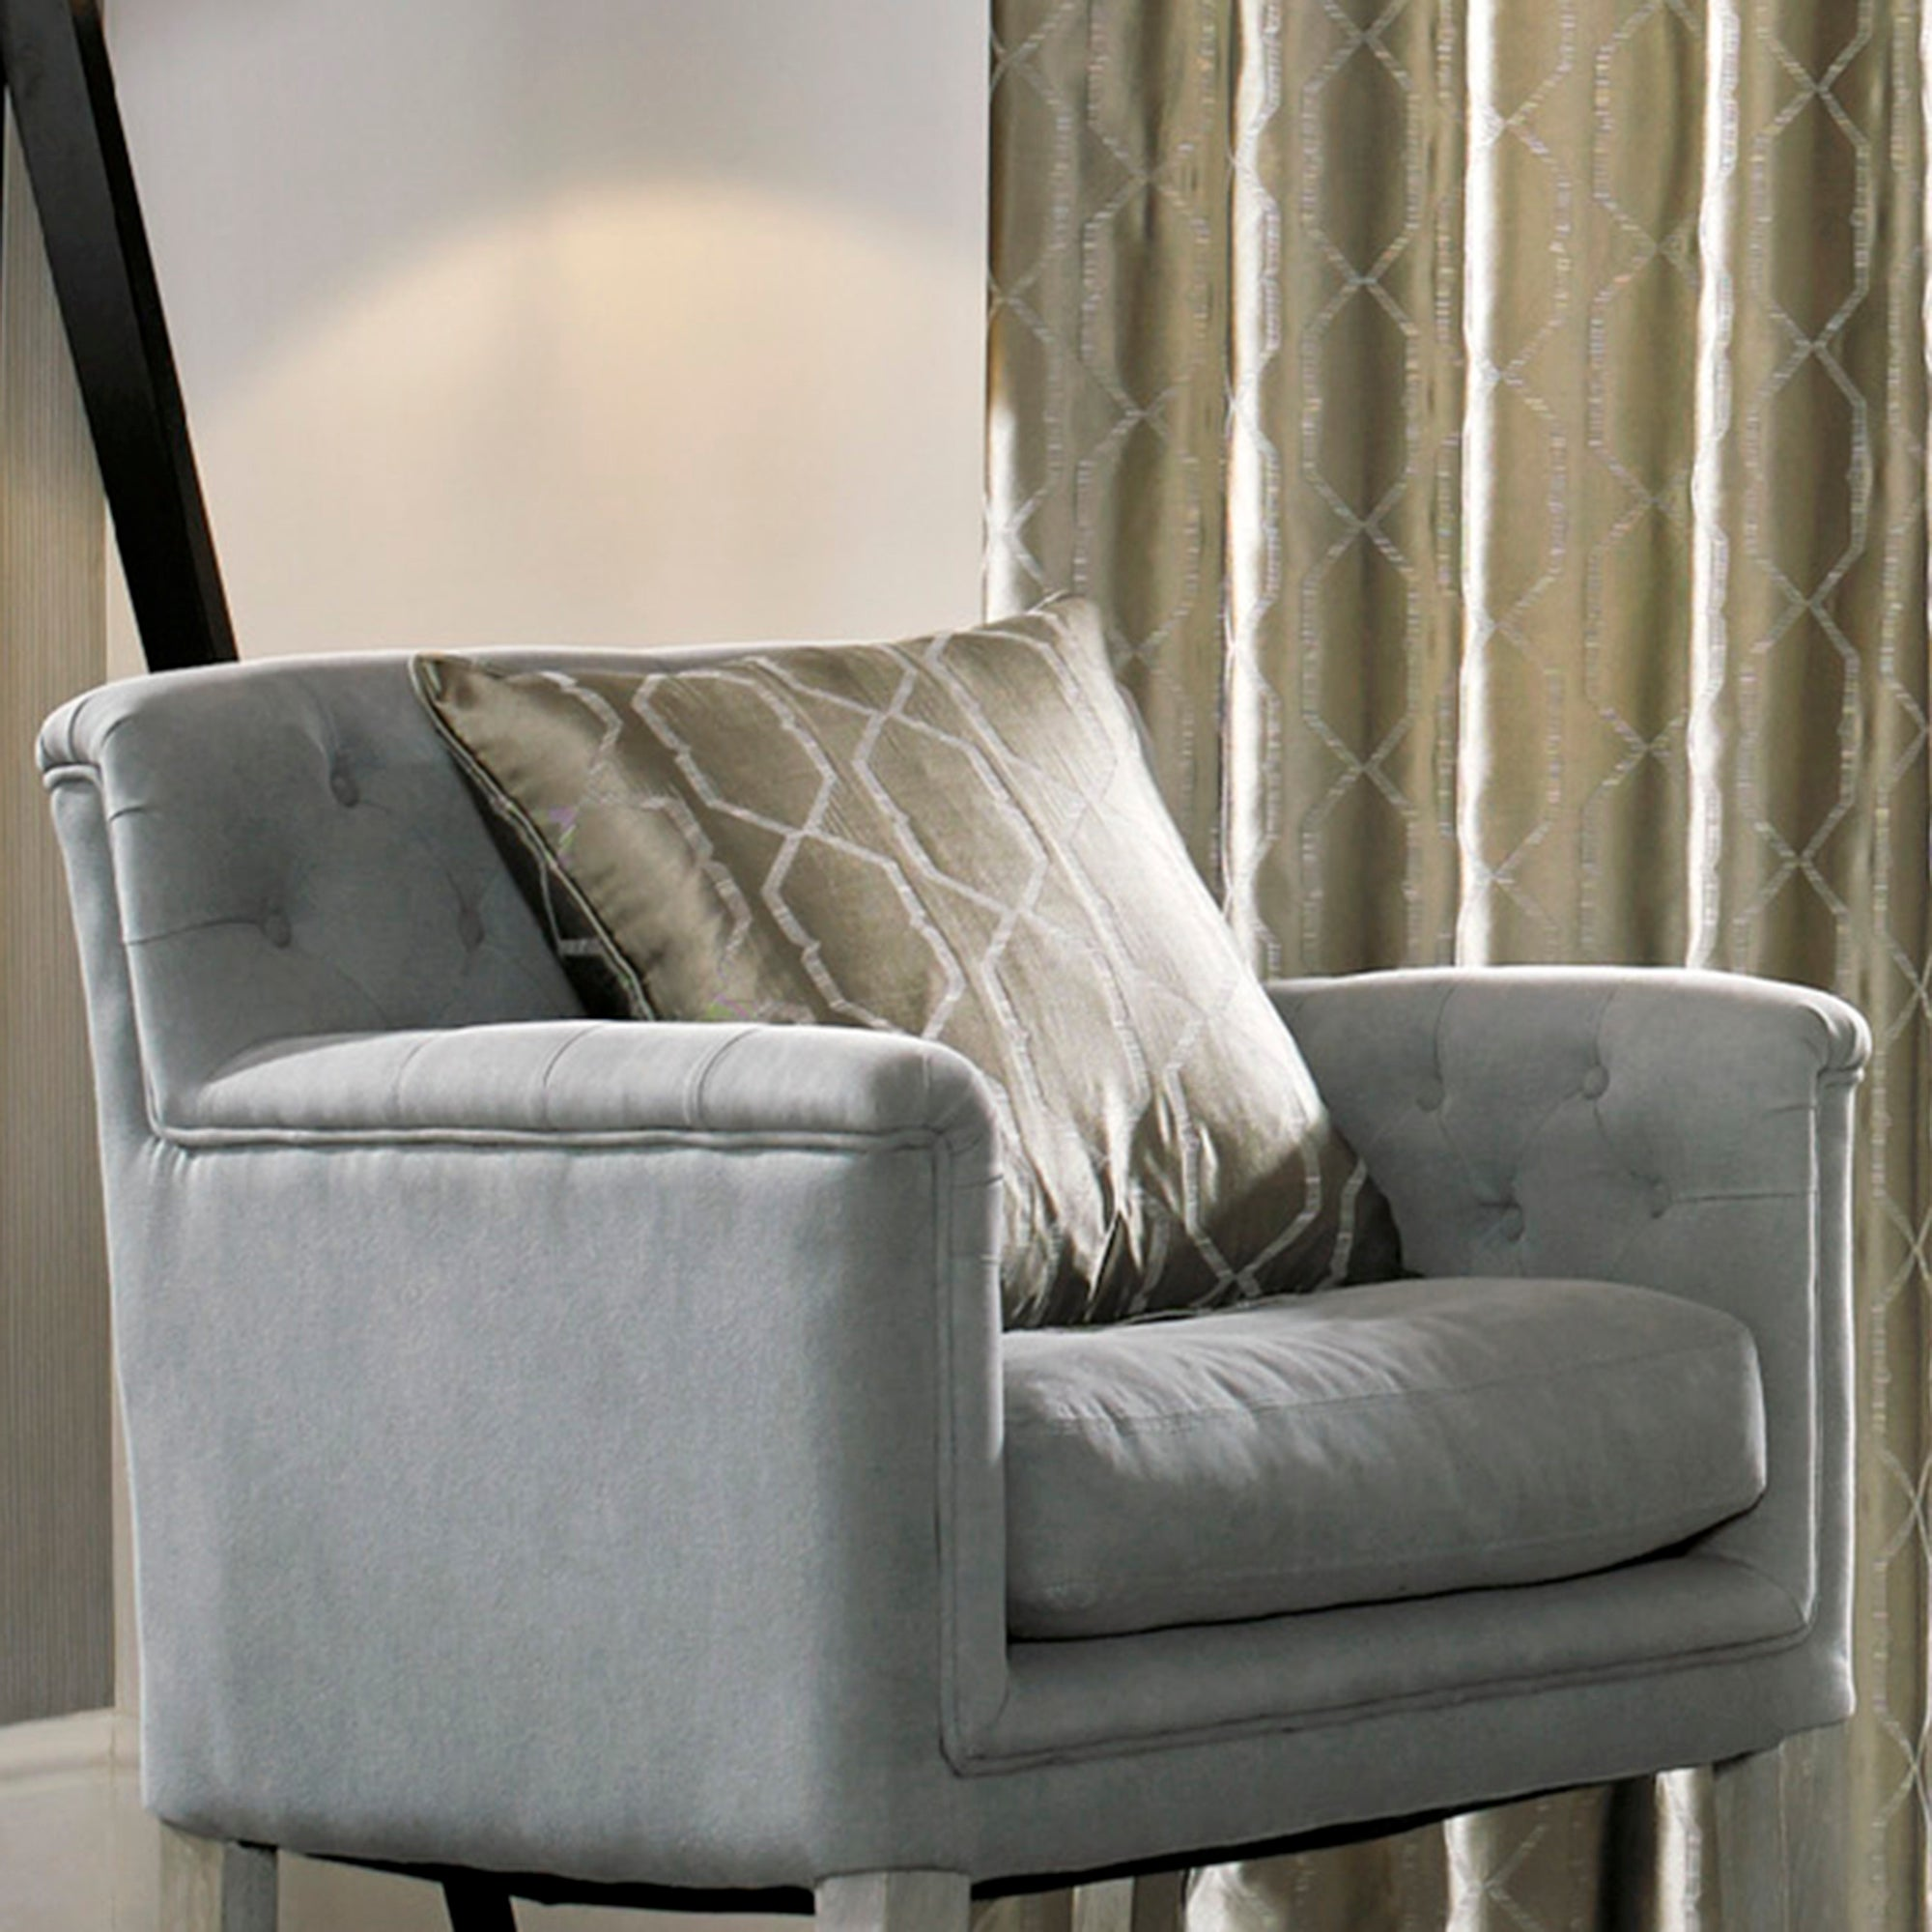 Hotel Mink Lexington Collection Cushion